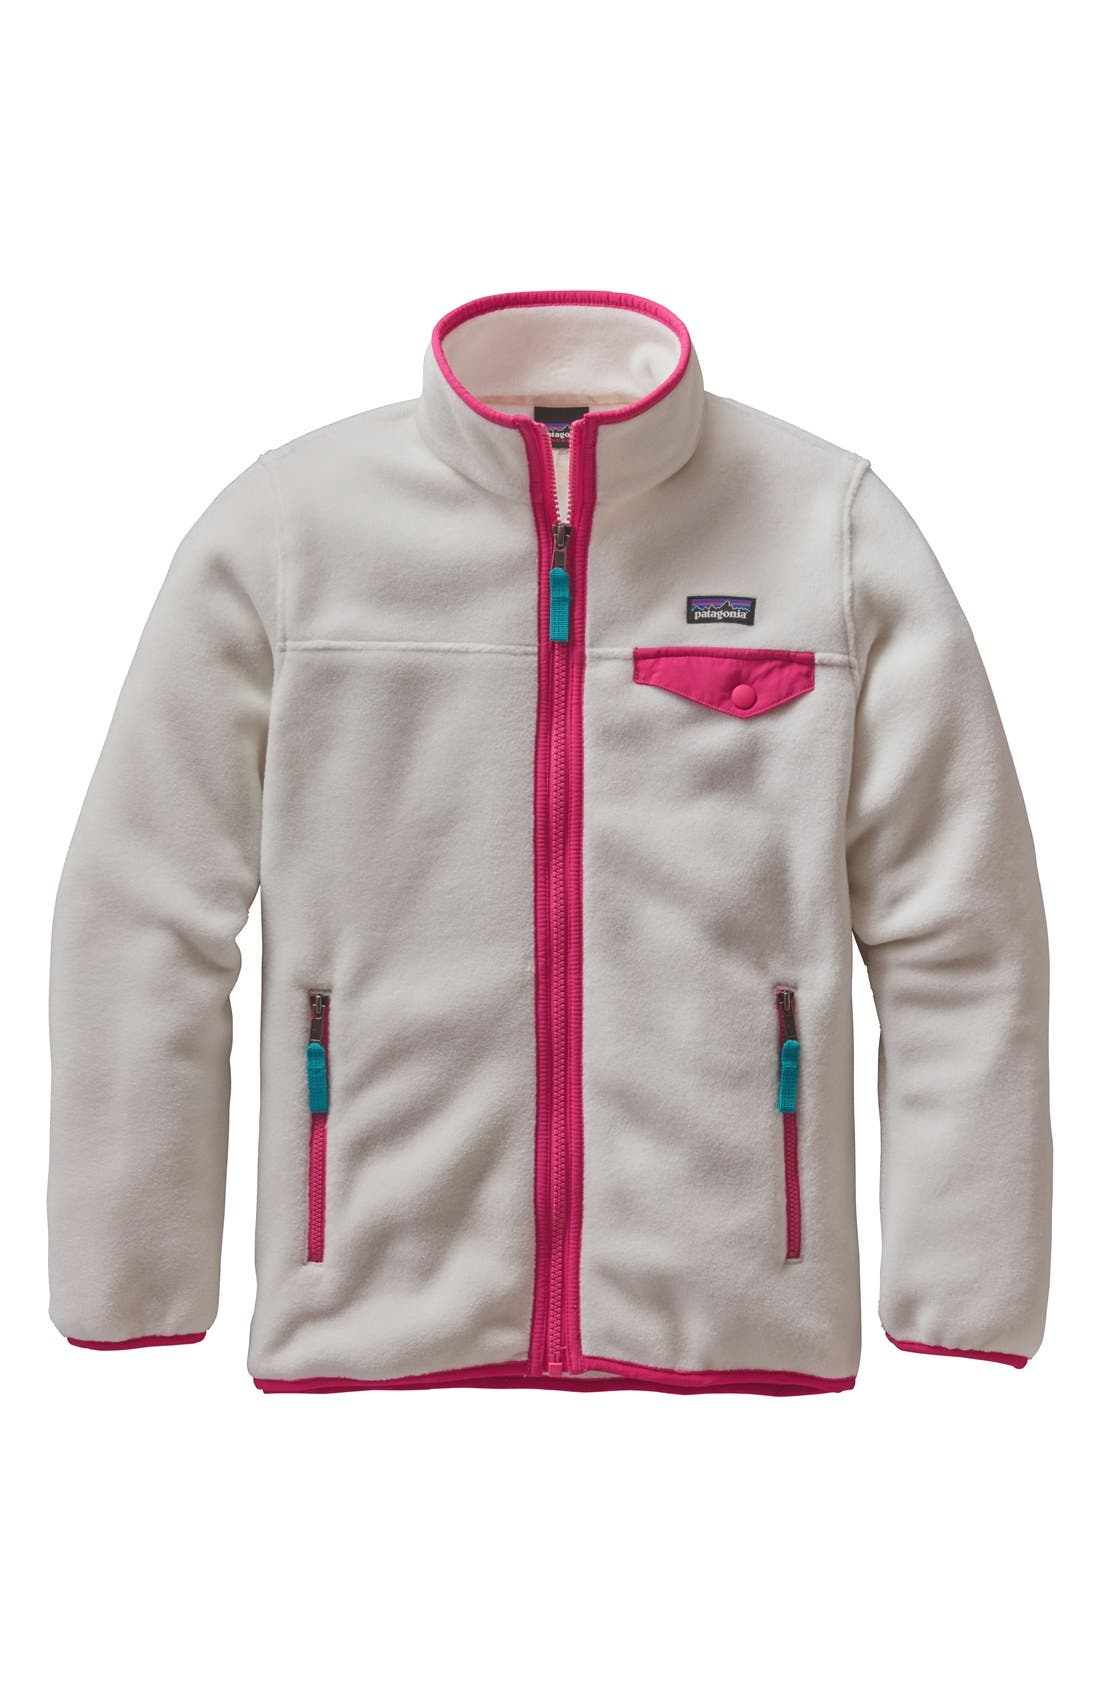 Synchilla<sup>®</sup> Snap-T<sup>®</sup> Fleece Jacket,                             Main thumbnail 4, color,